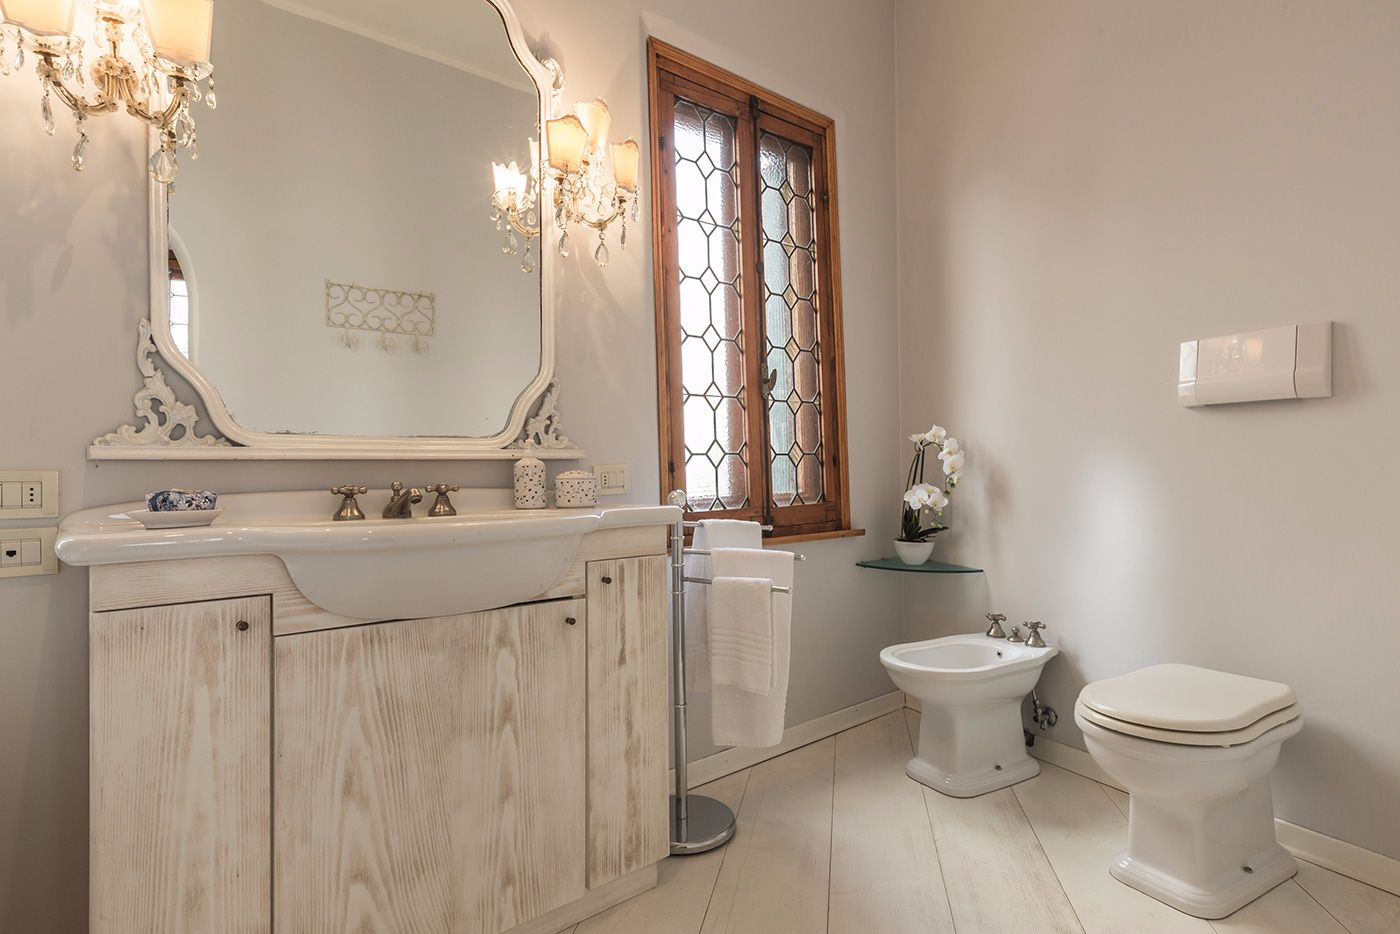 the spacious en-suite bathroom